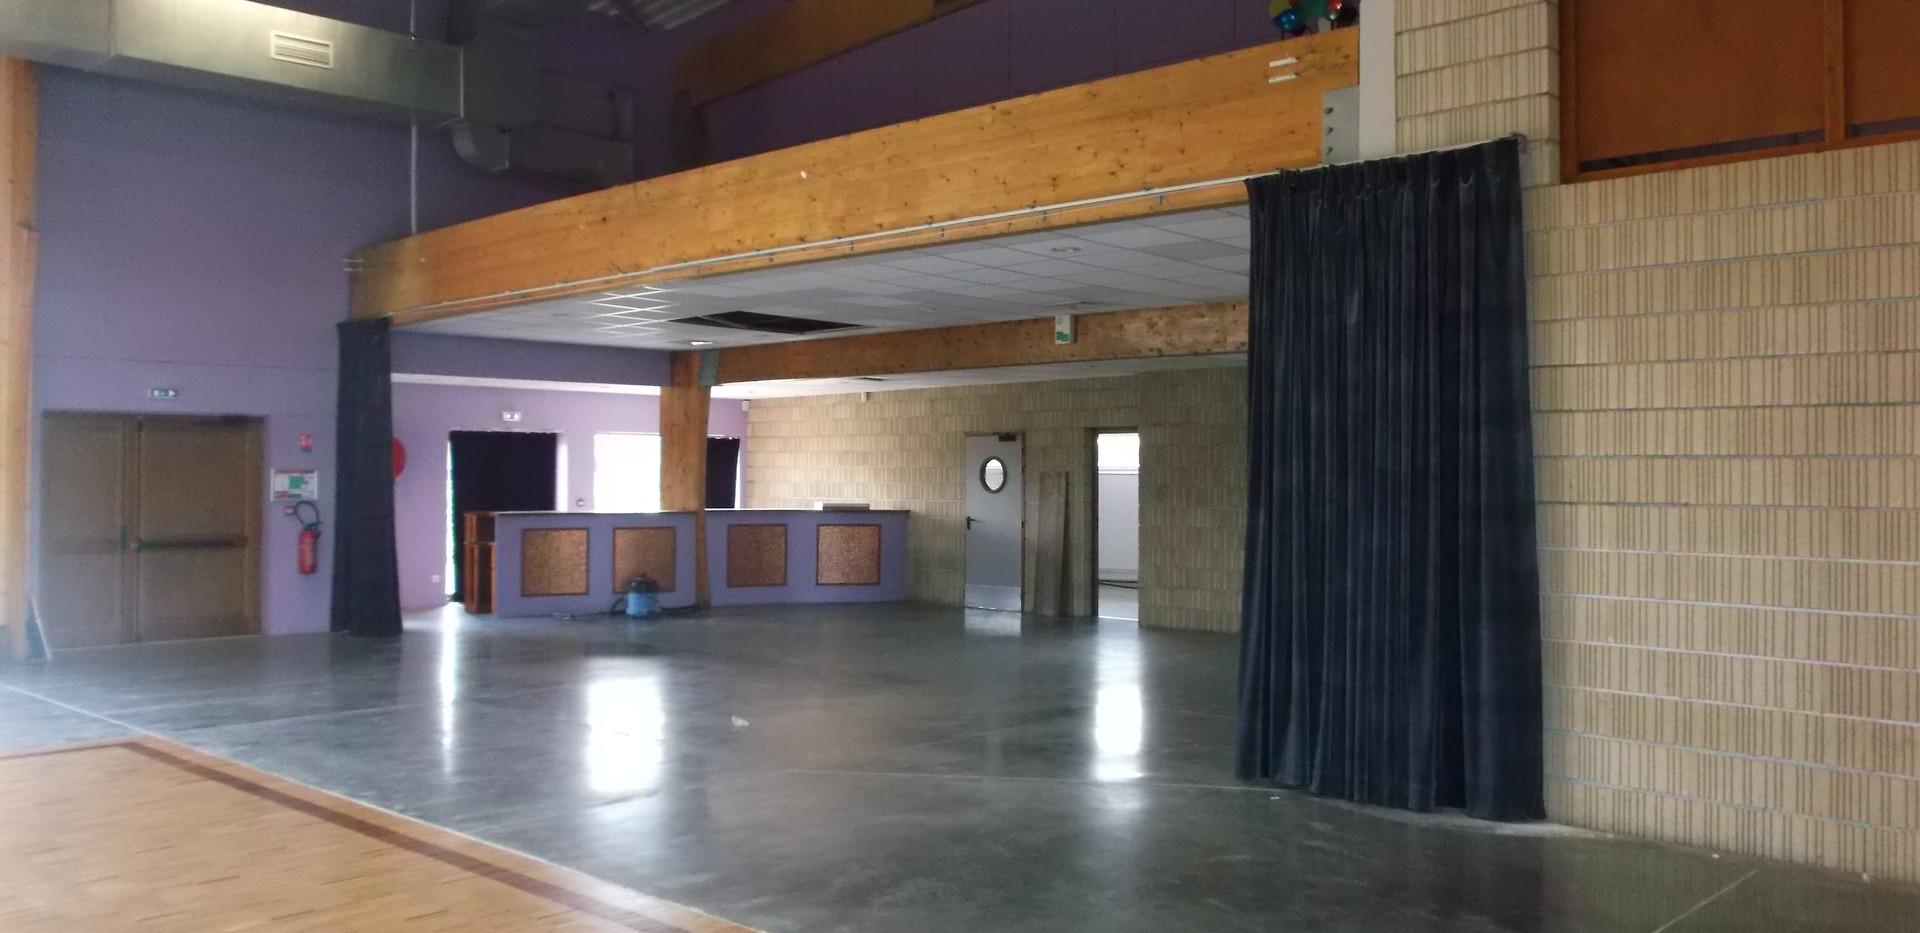 Salle des fêtes Montmartin sur mer